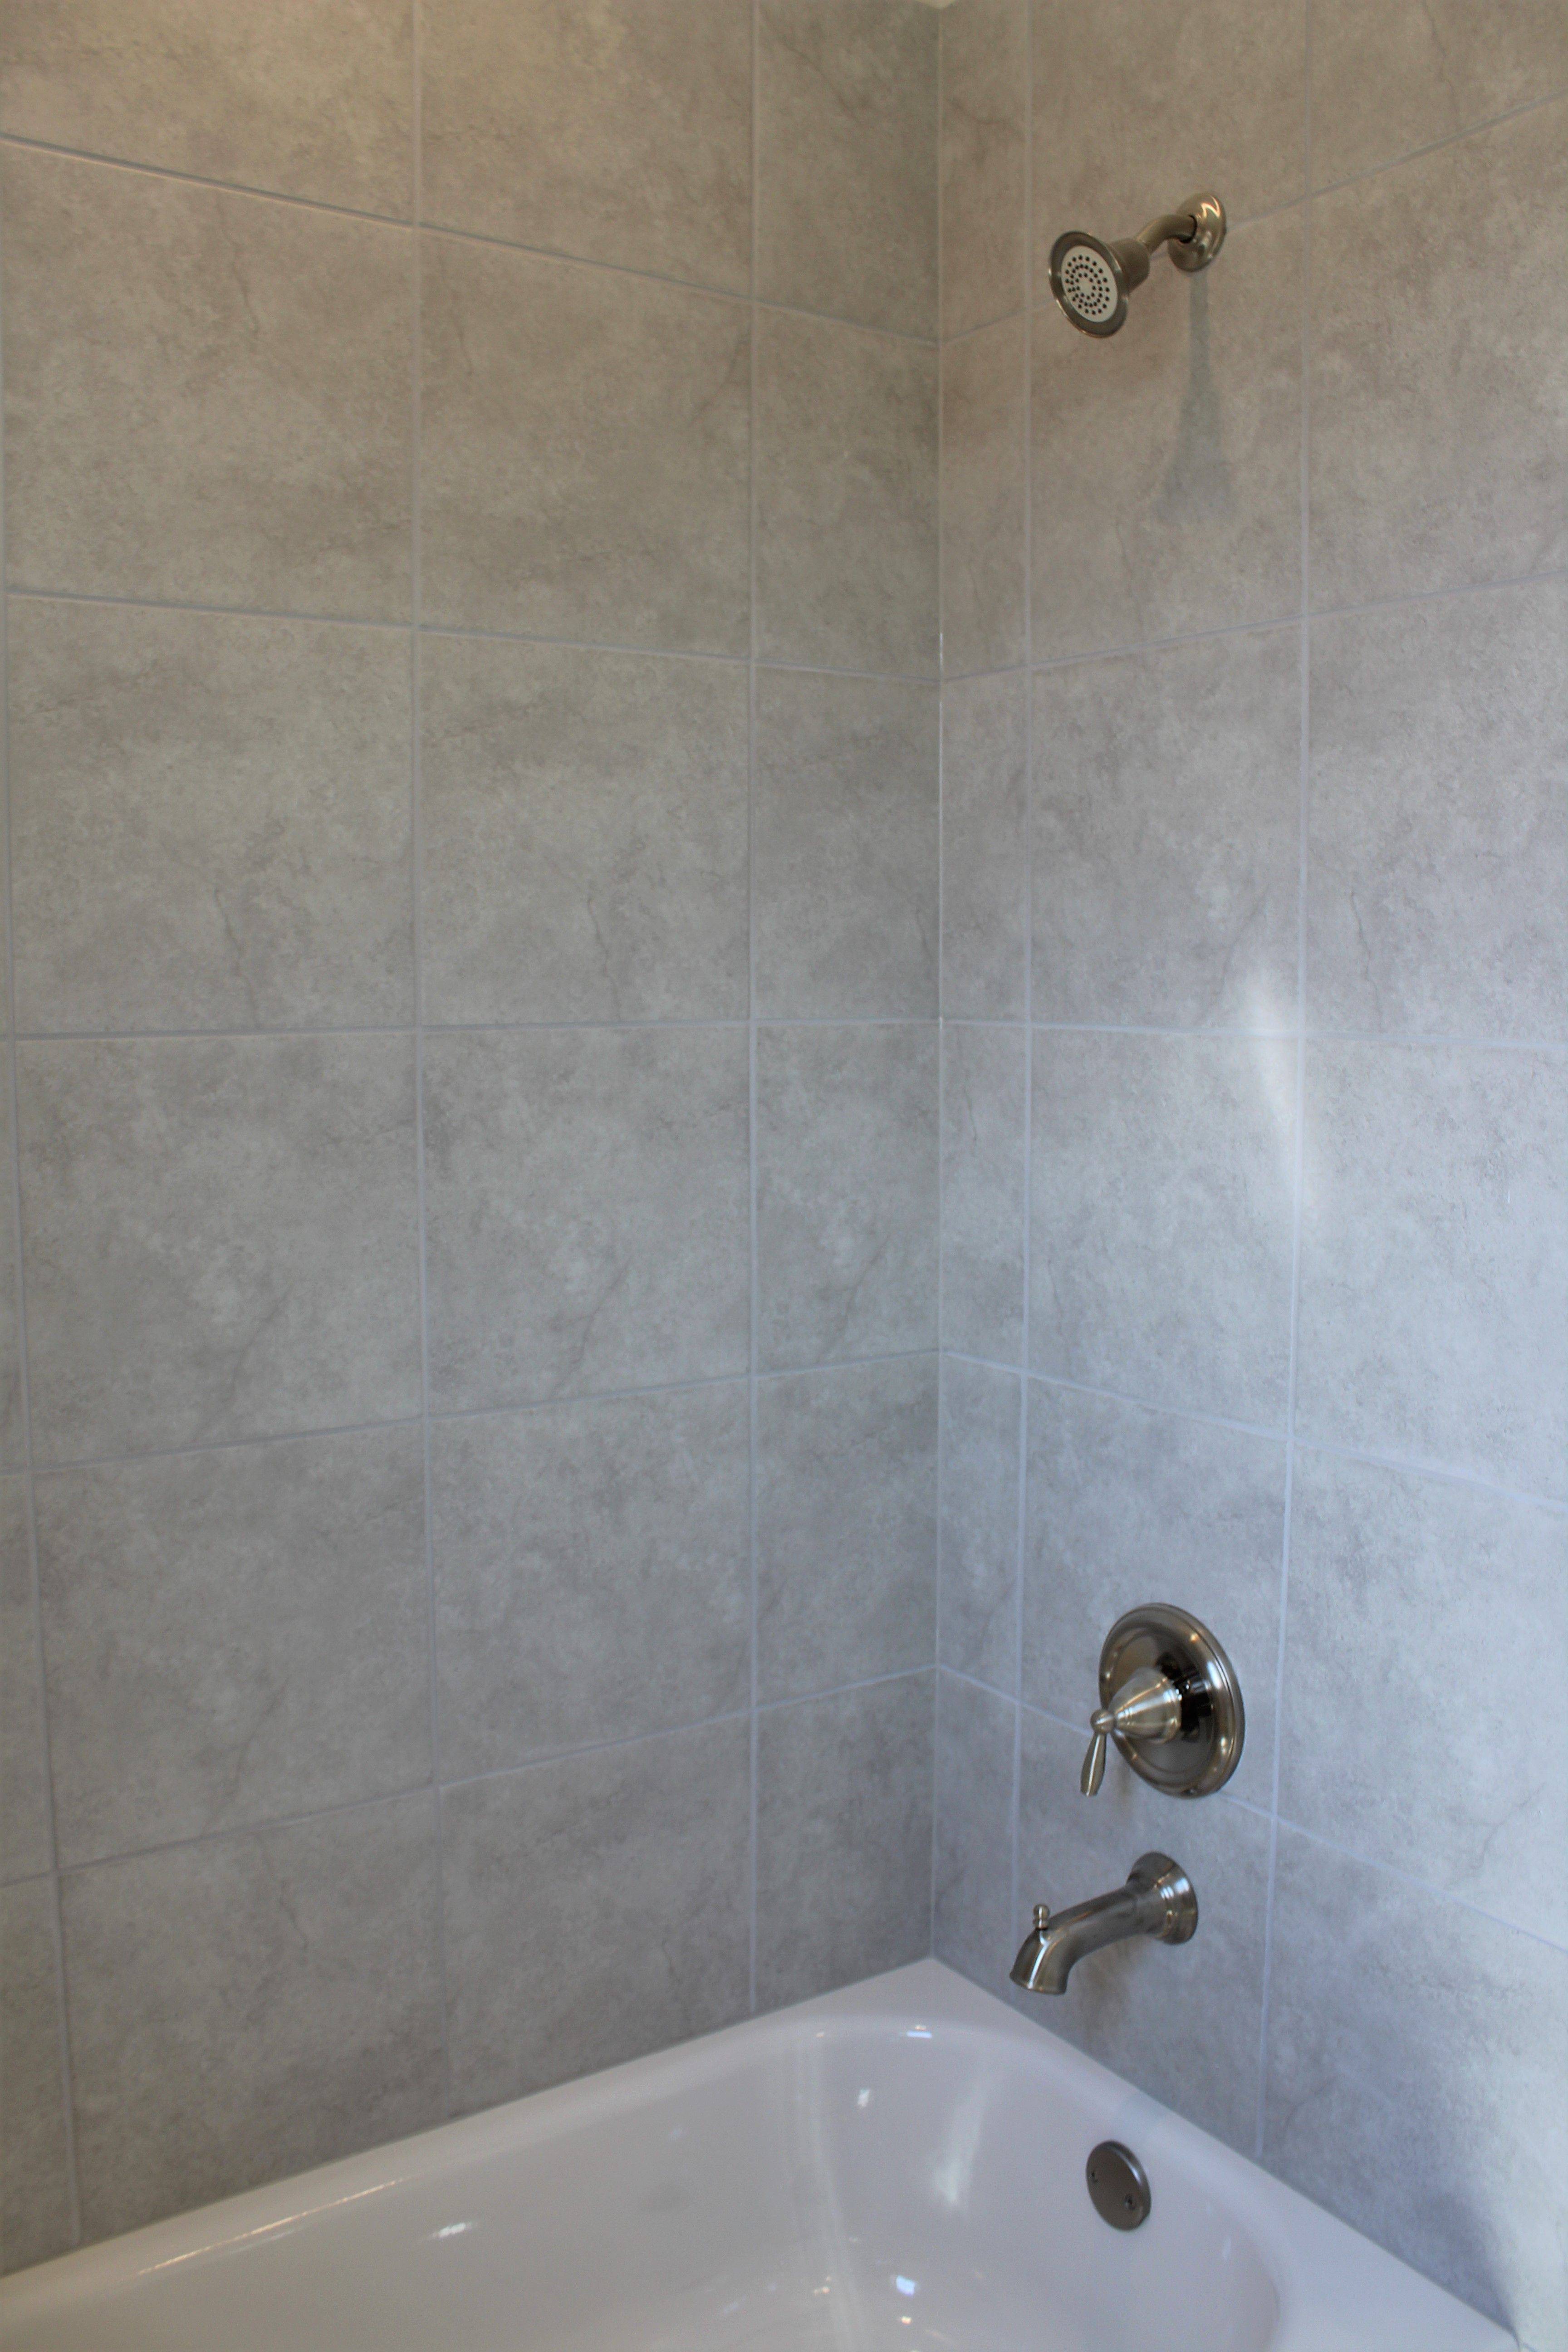 Bathroom featured in the Henderson By Regency Homebuilders in Memphis, TN